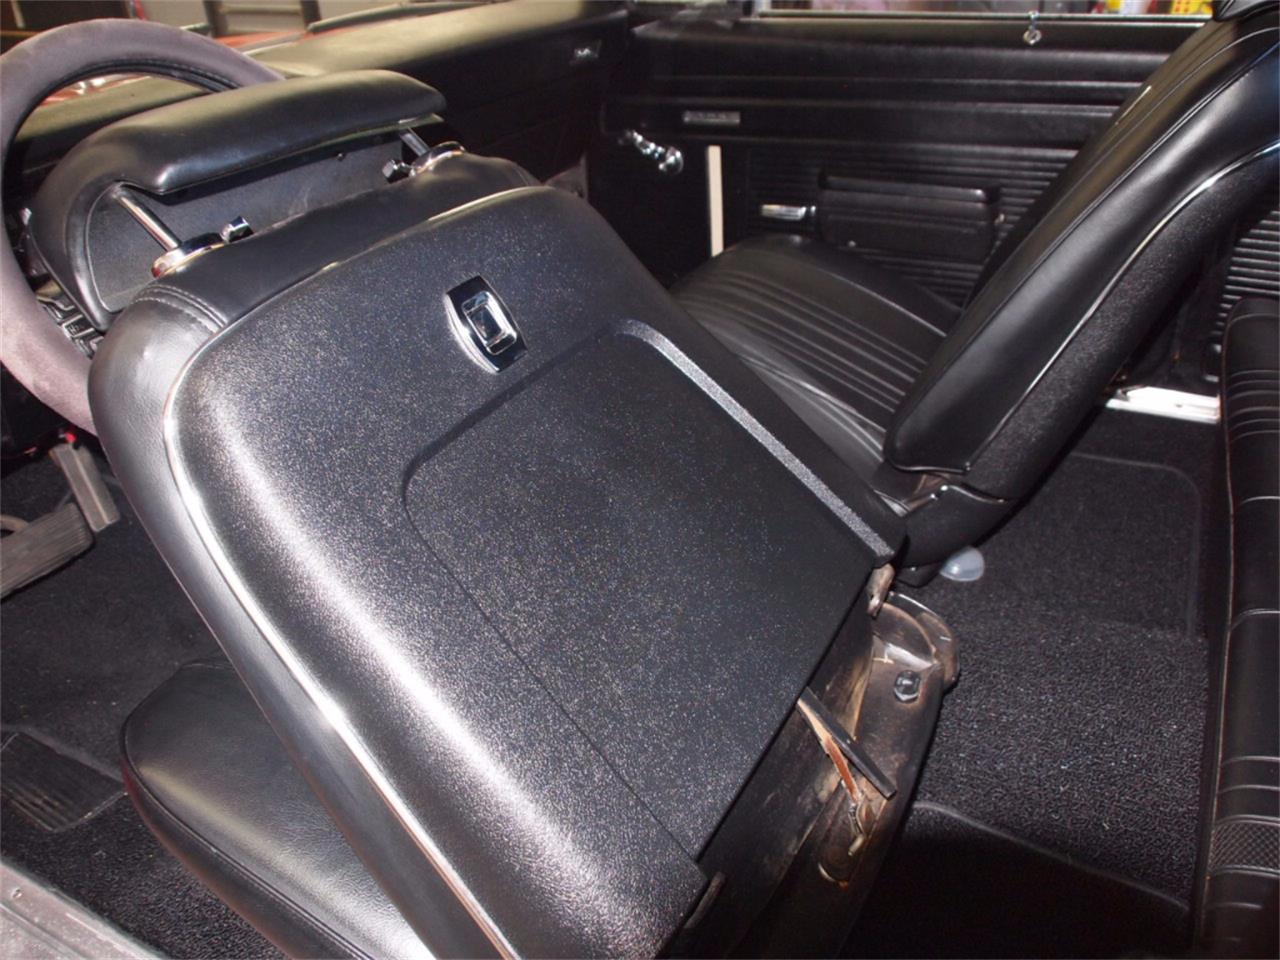 Large Picture of Classic 1971 Chevrolet Nova located in Ohio - $29,900.00 - M5W2